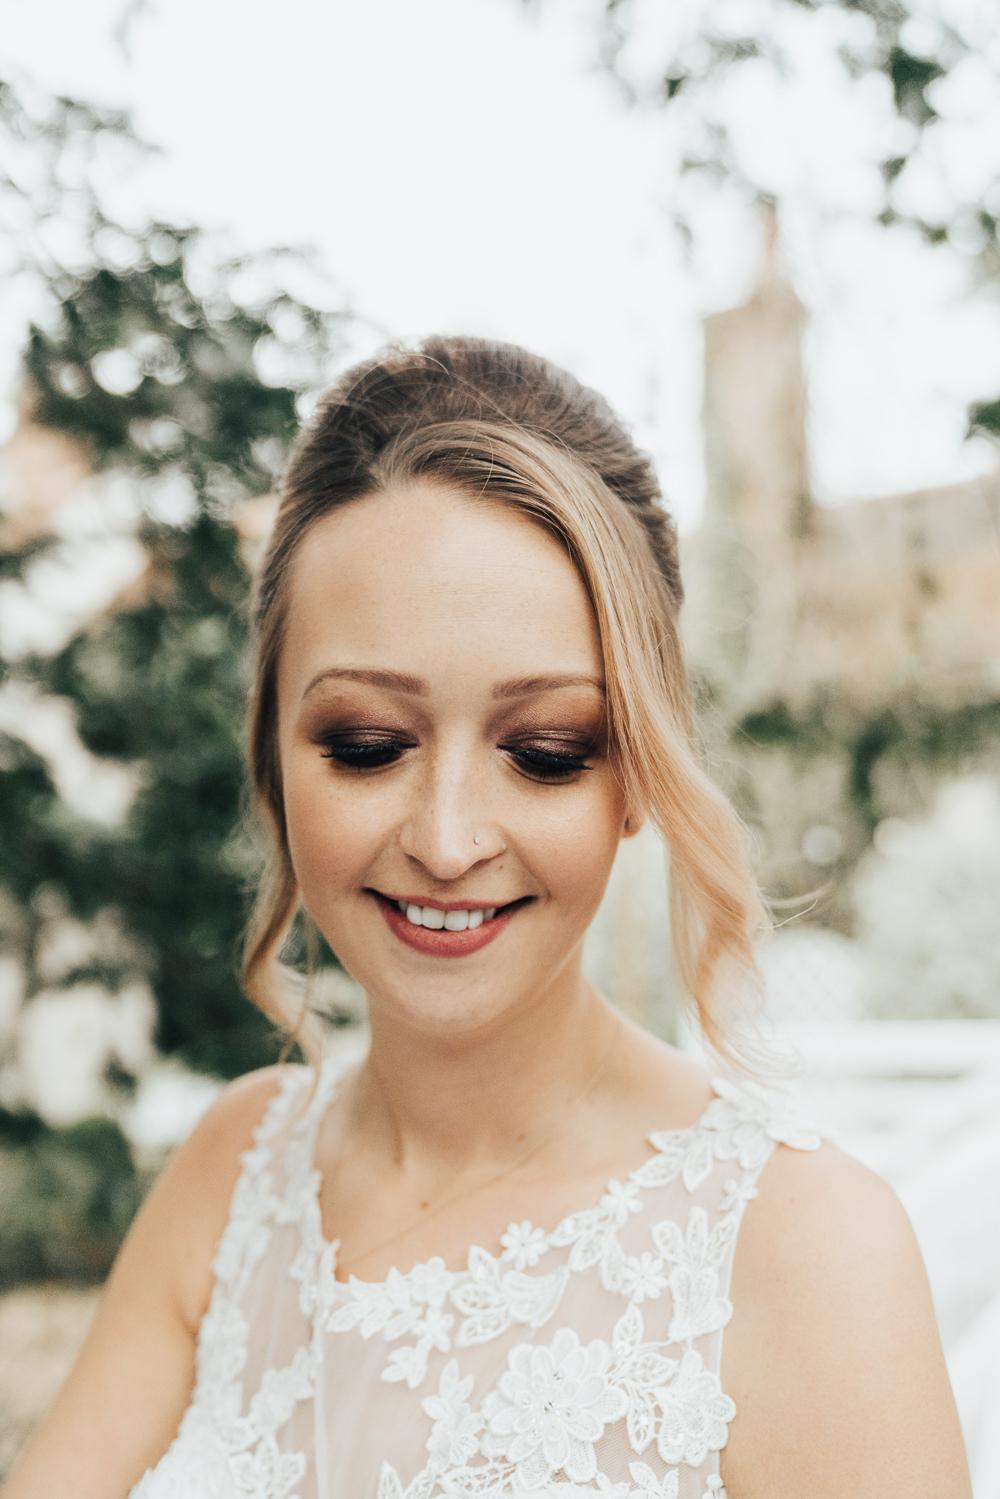 Bride Bridal Make Up Hoop Wedding Ideas Rebecca Carpenter Photography